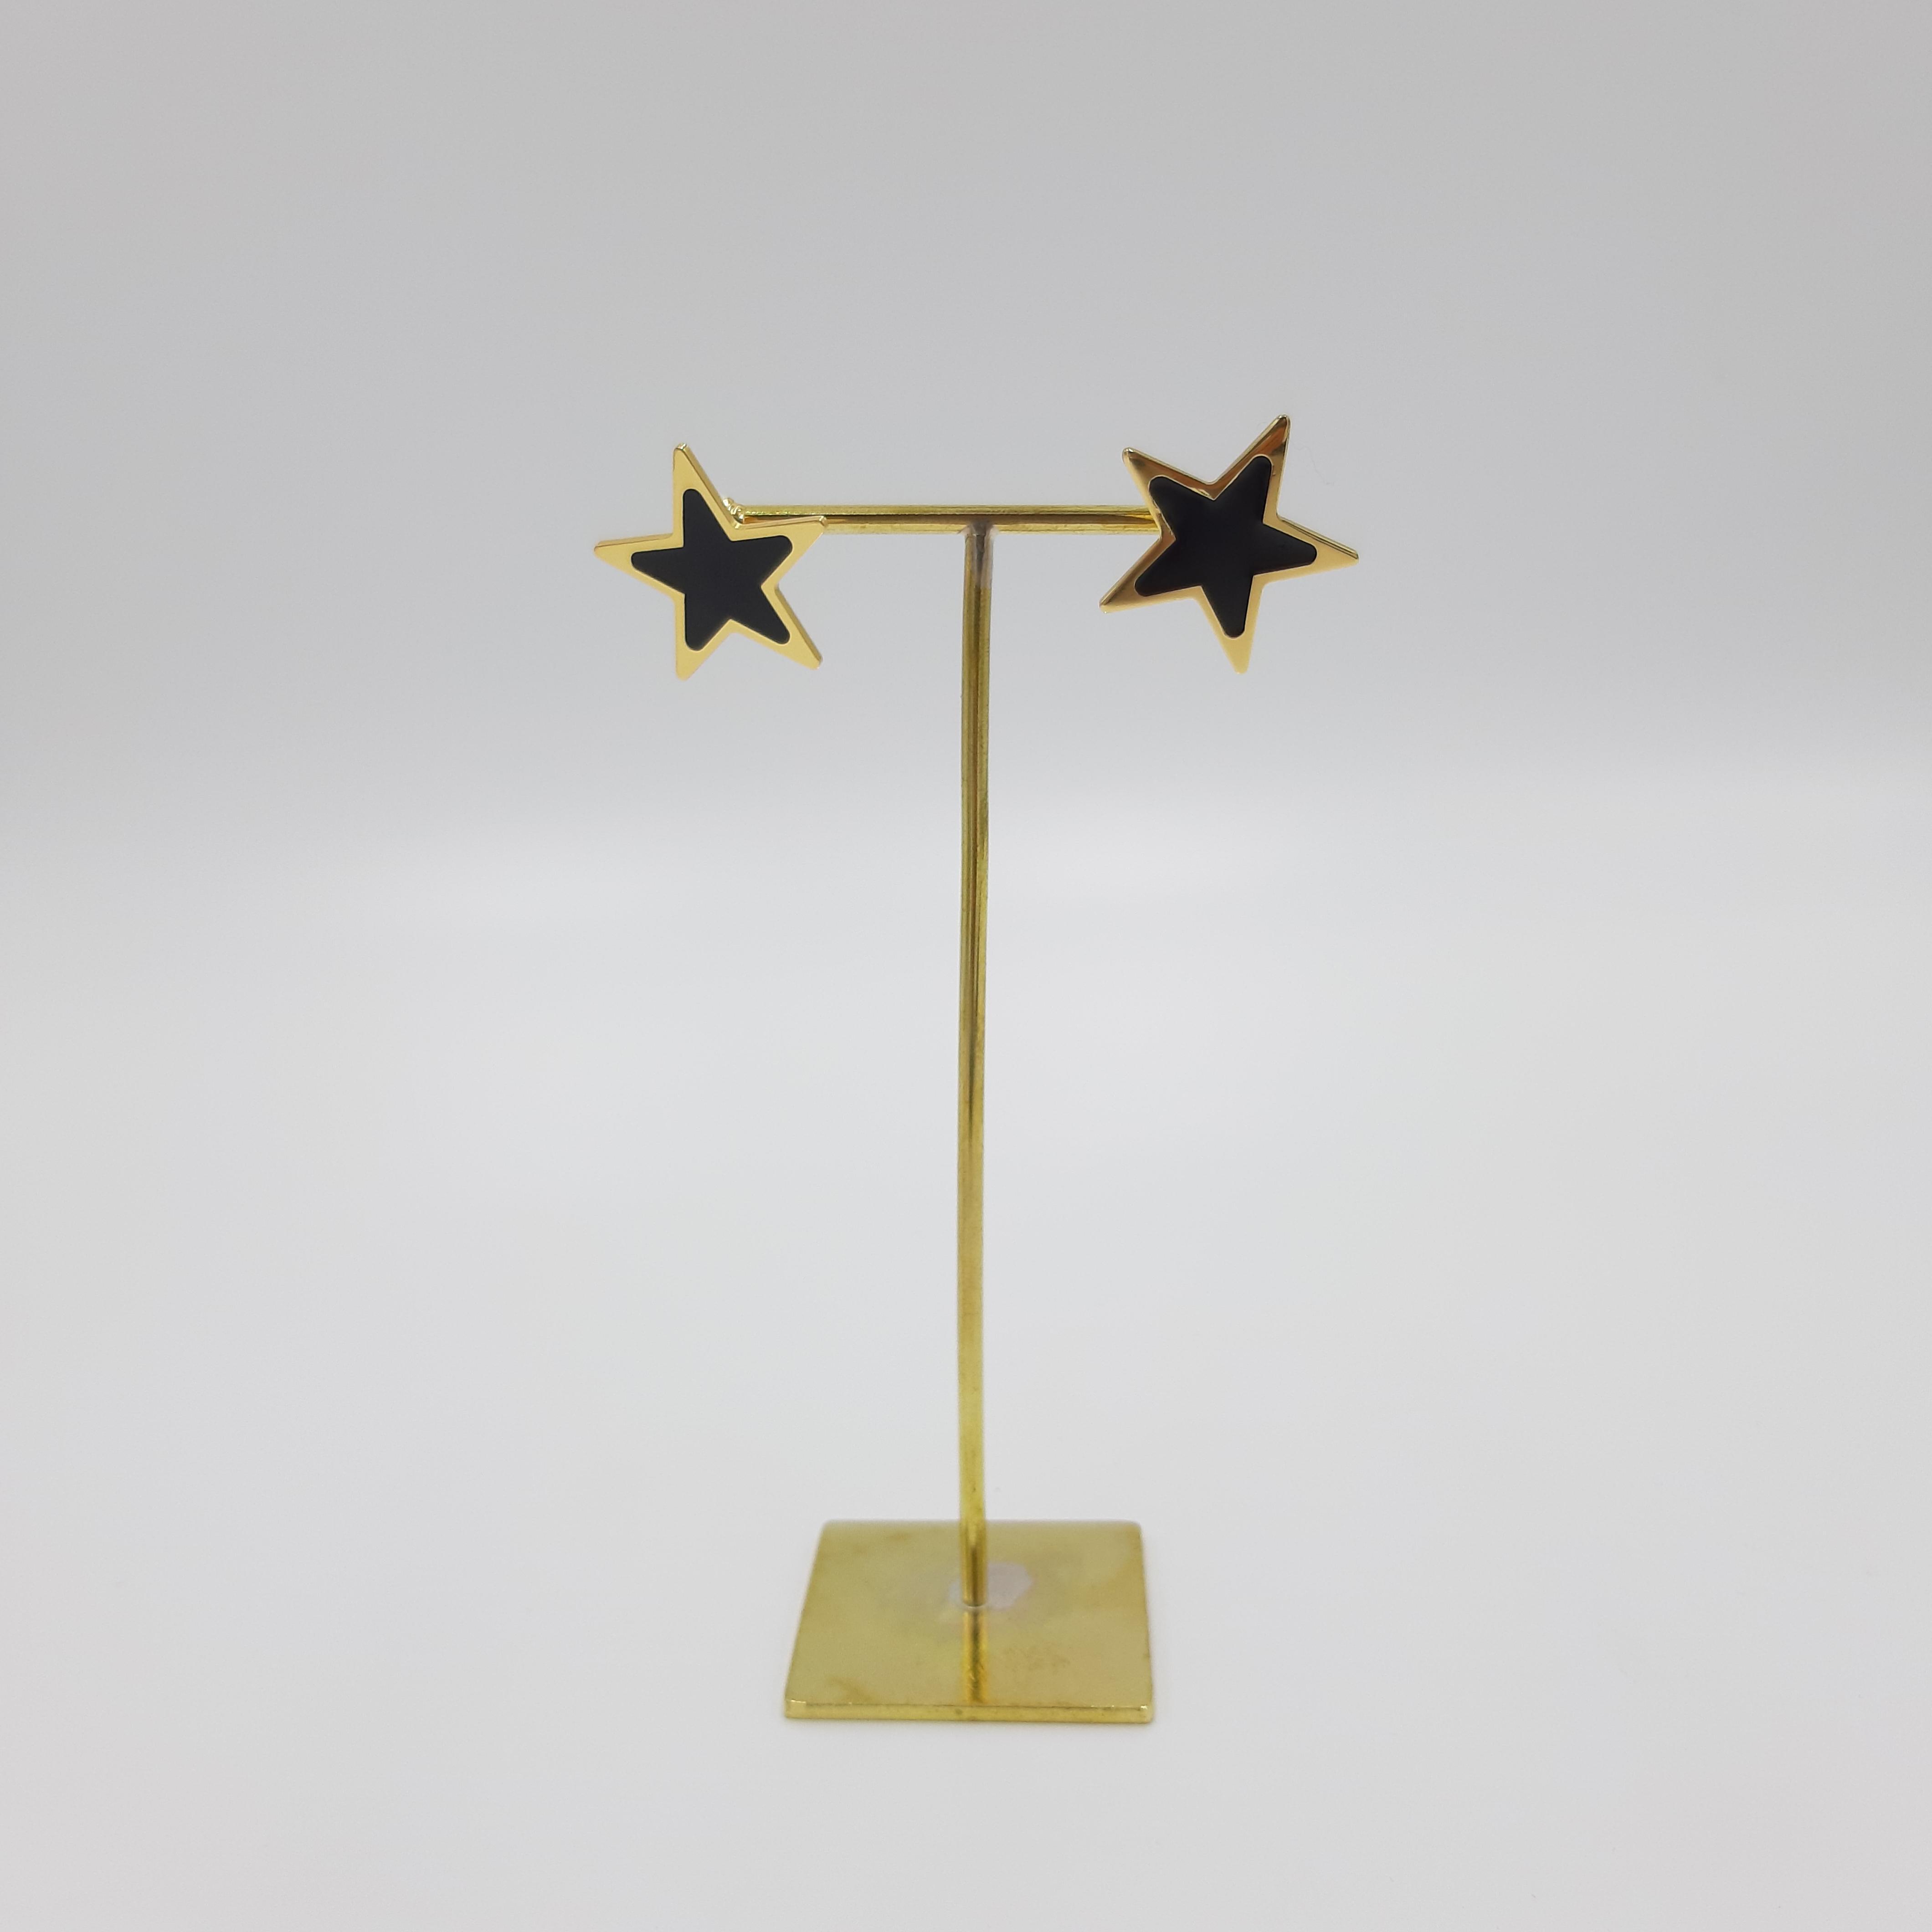 Orecchini stella neri Francesca Bianchi Design